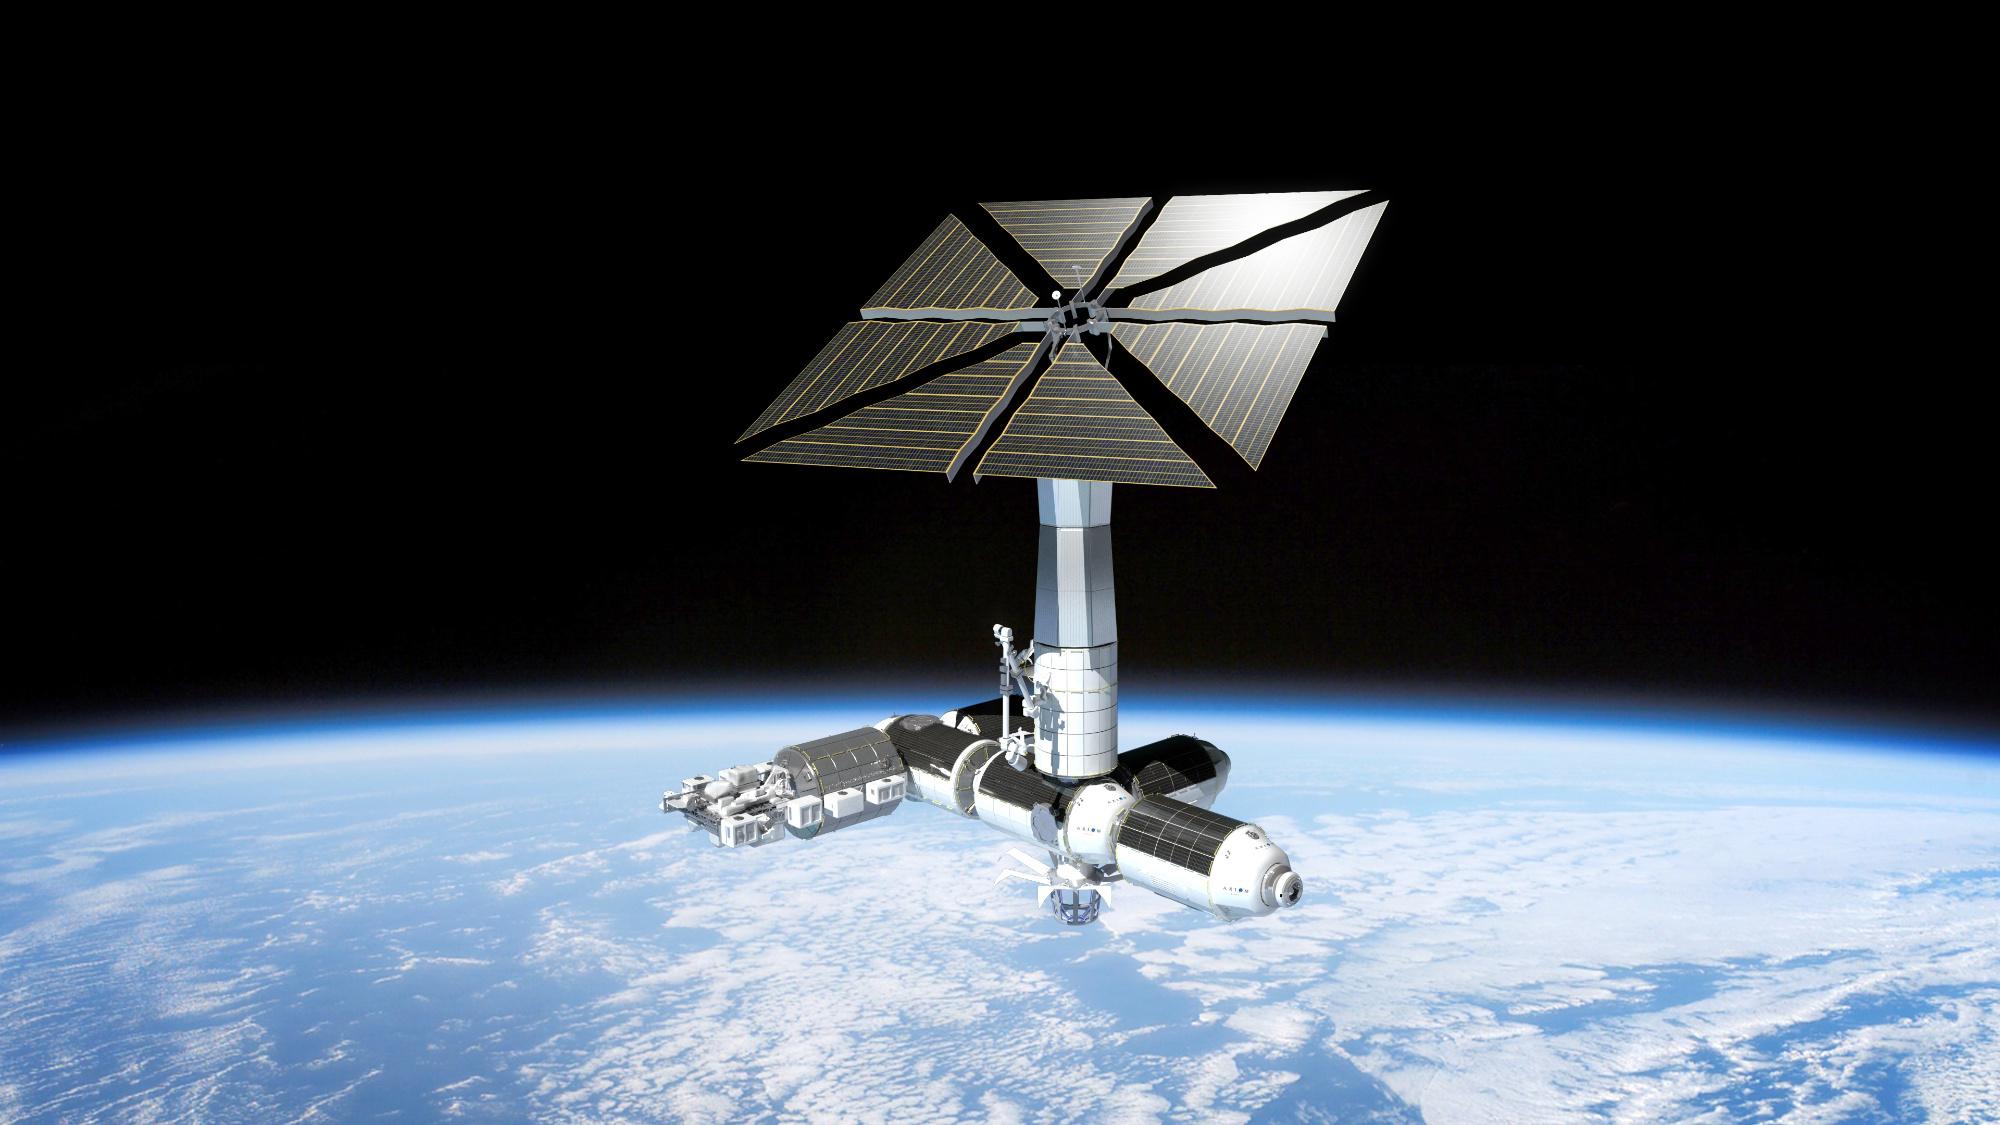 2018 stellt Axiom Space die kommerzielle Raumstation Axiom Space Stationvor. Bildcredit: Axiom Space